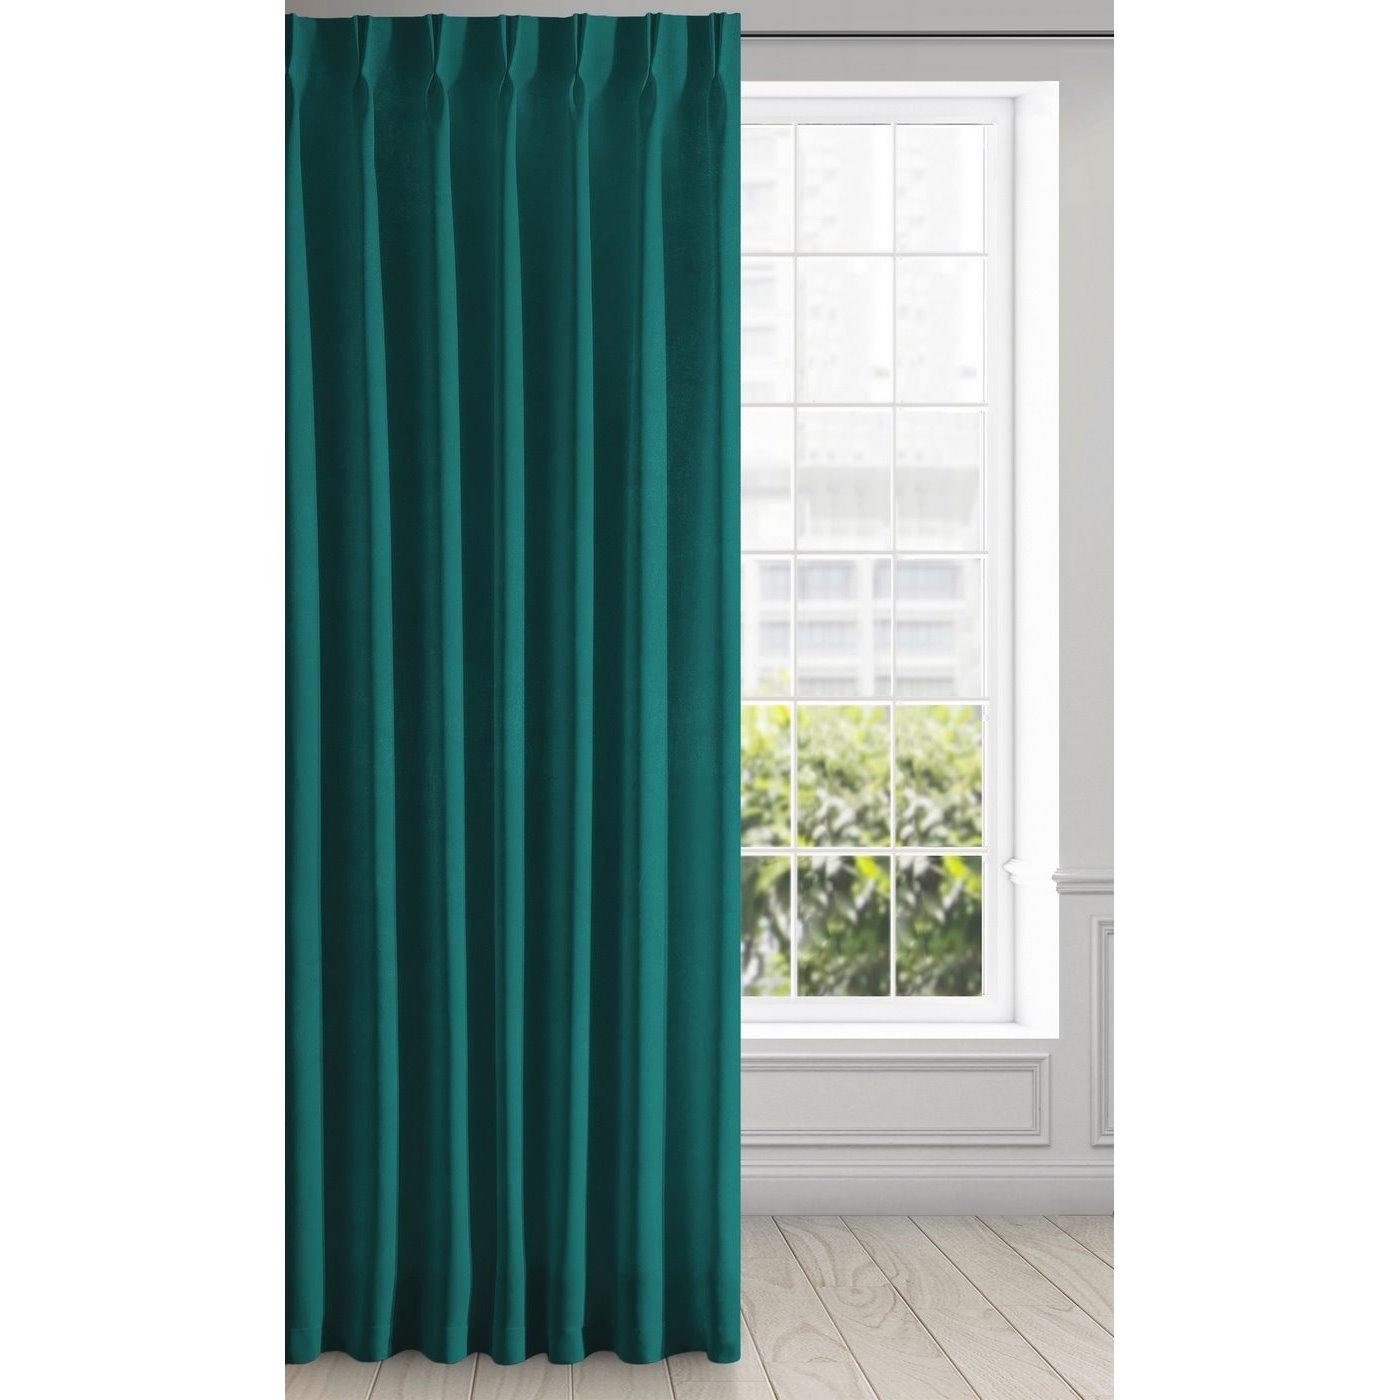 Draperie Ines Velvet Verde, 140 x 270 cm, 1 bucata poza